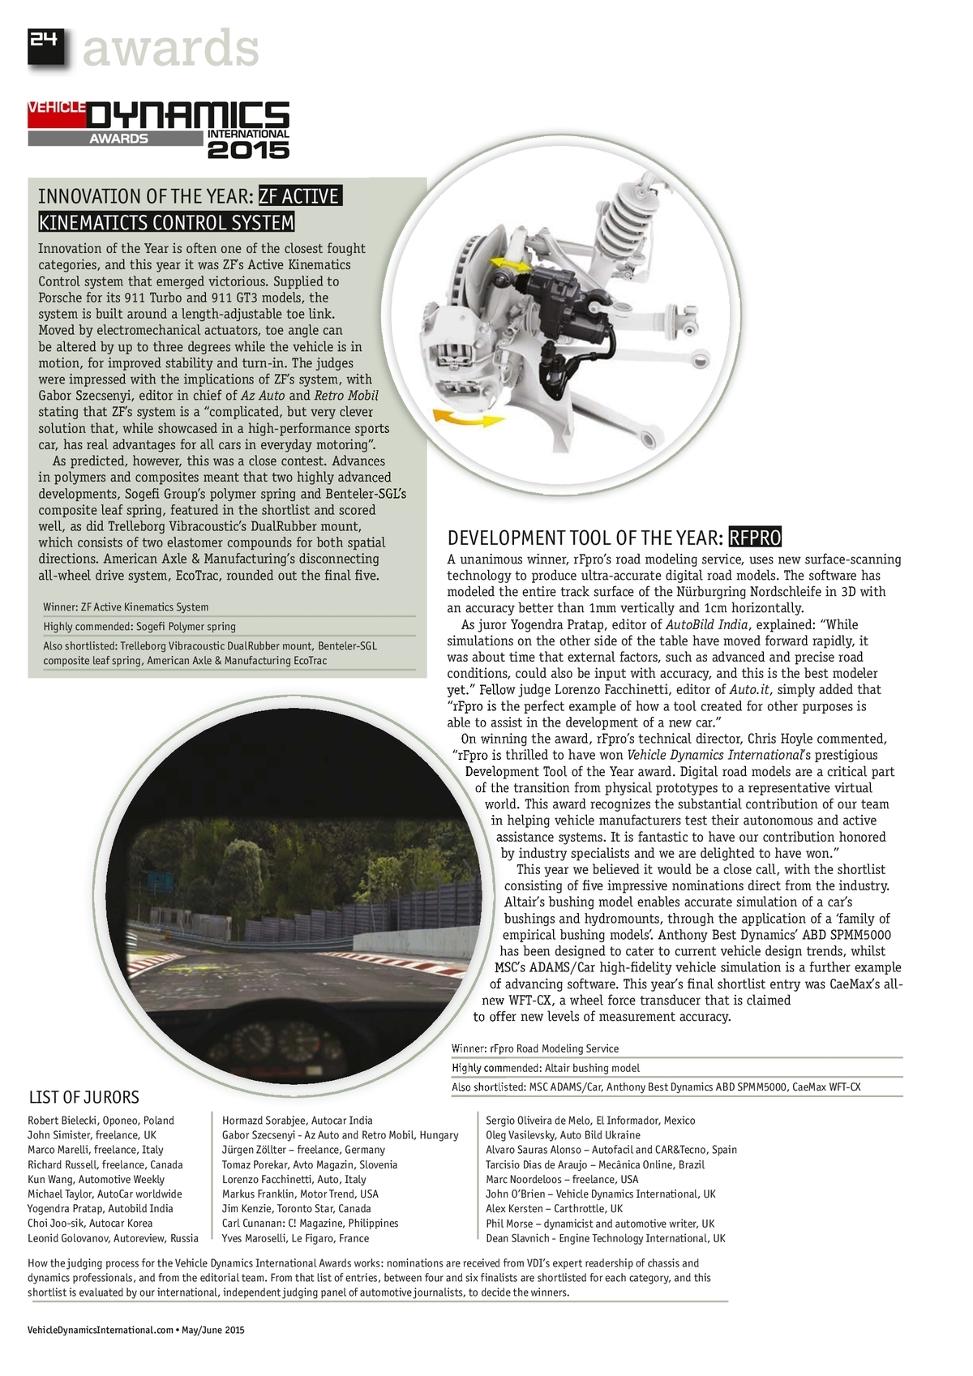 May/June 2015 Vehicle Dynamics International - UKi